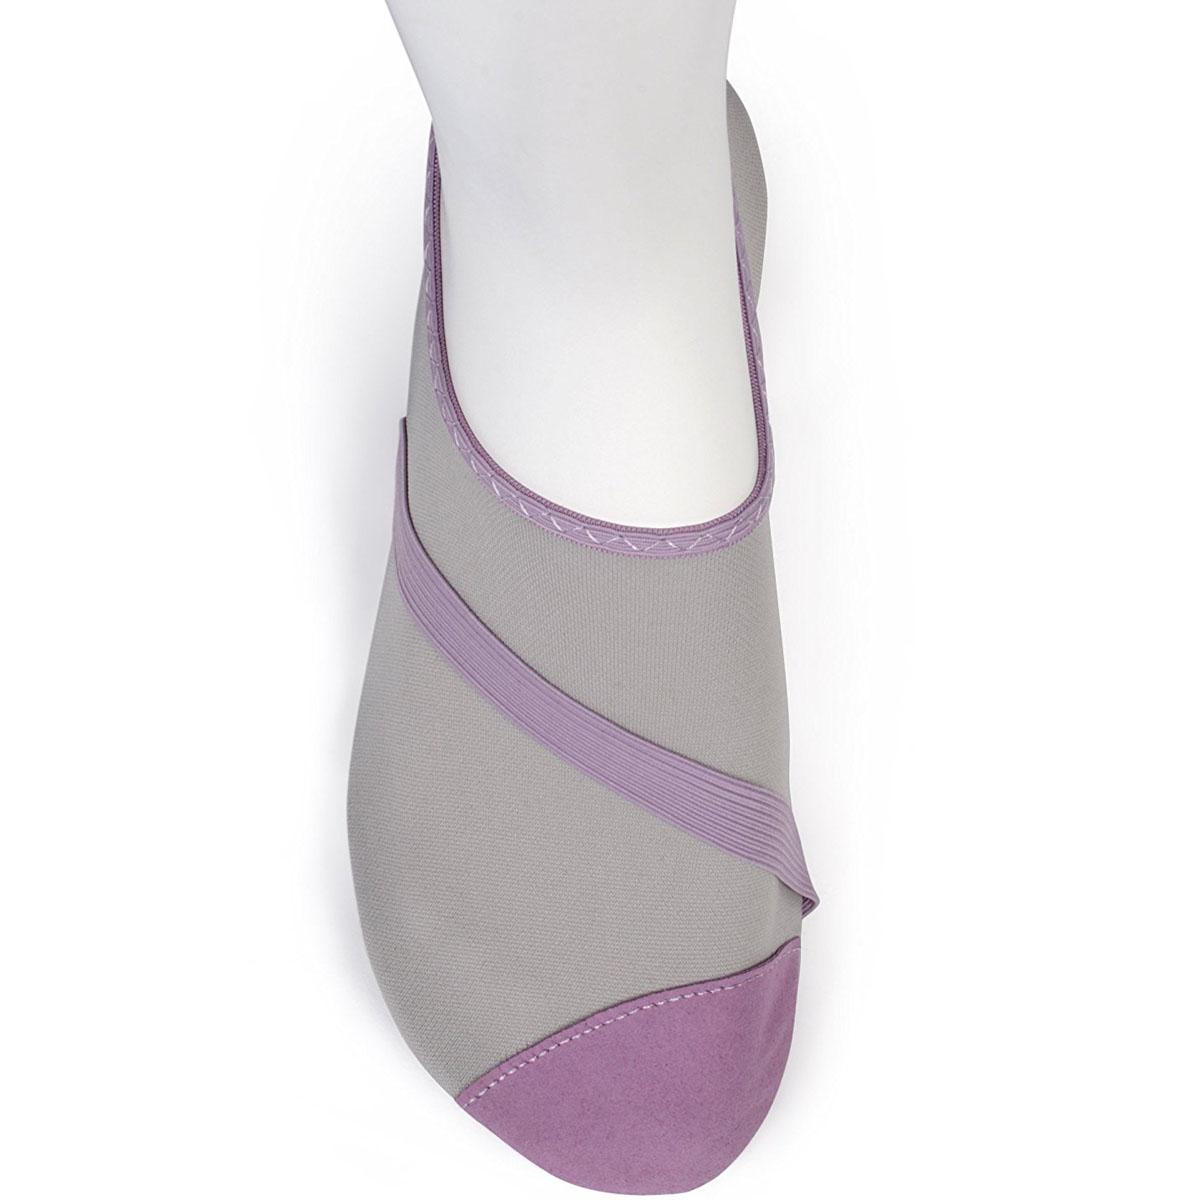 FitKicks-Women-039-s-Non-Slip-Sole-Active-Footwear thumbnail 28